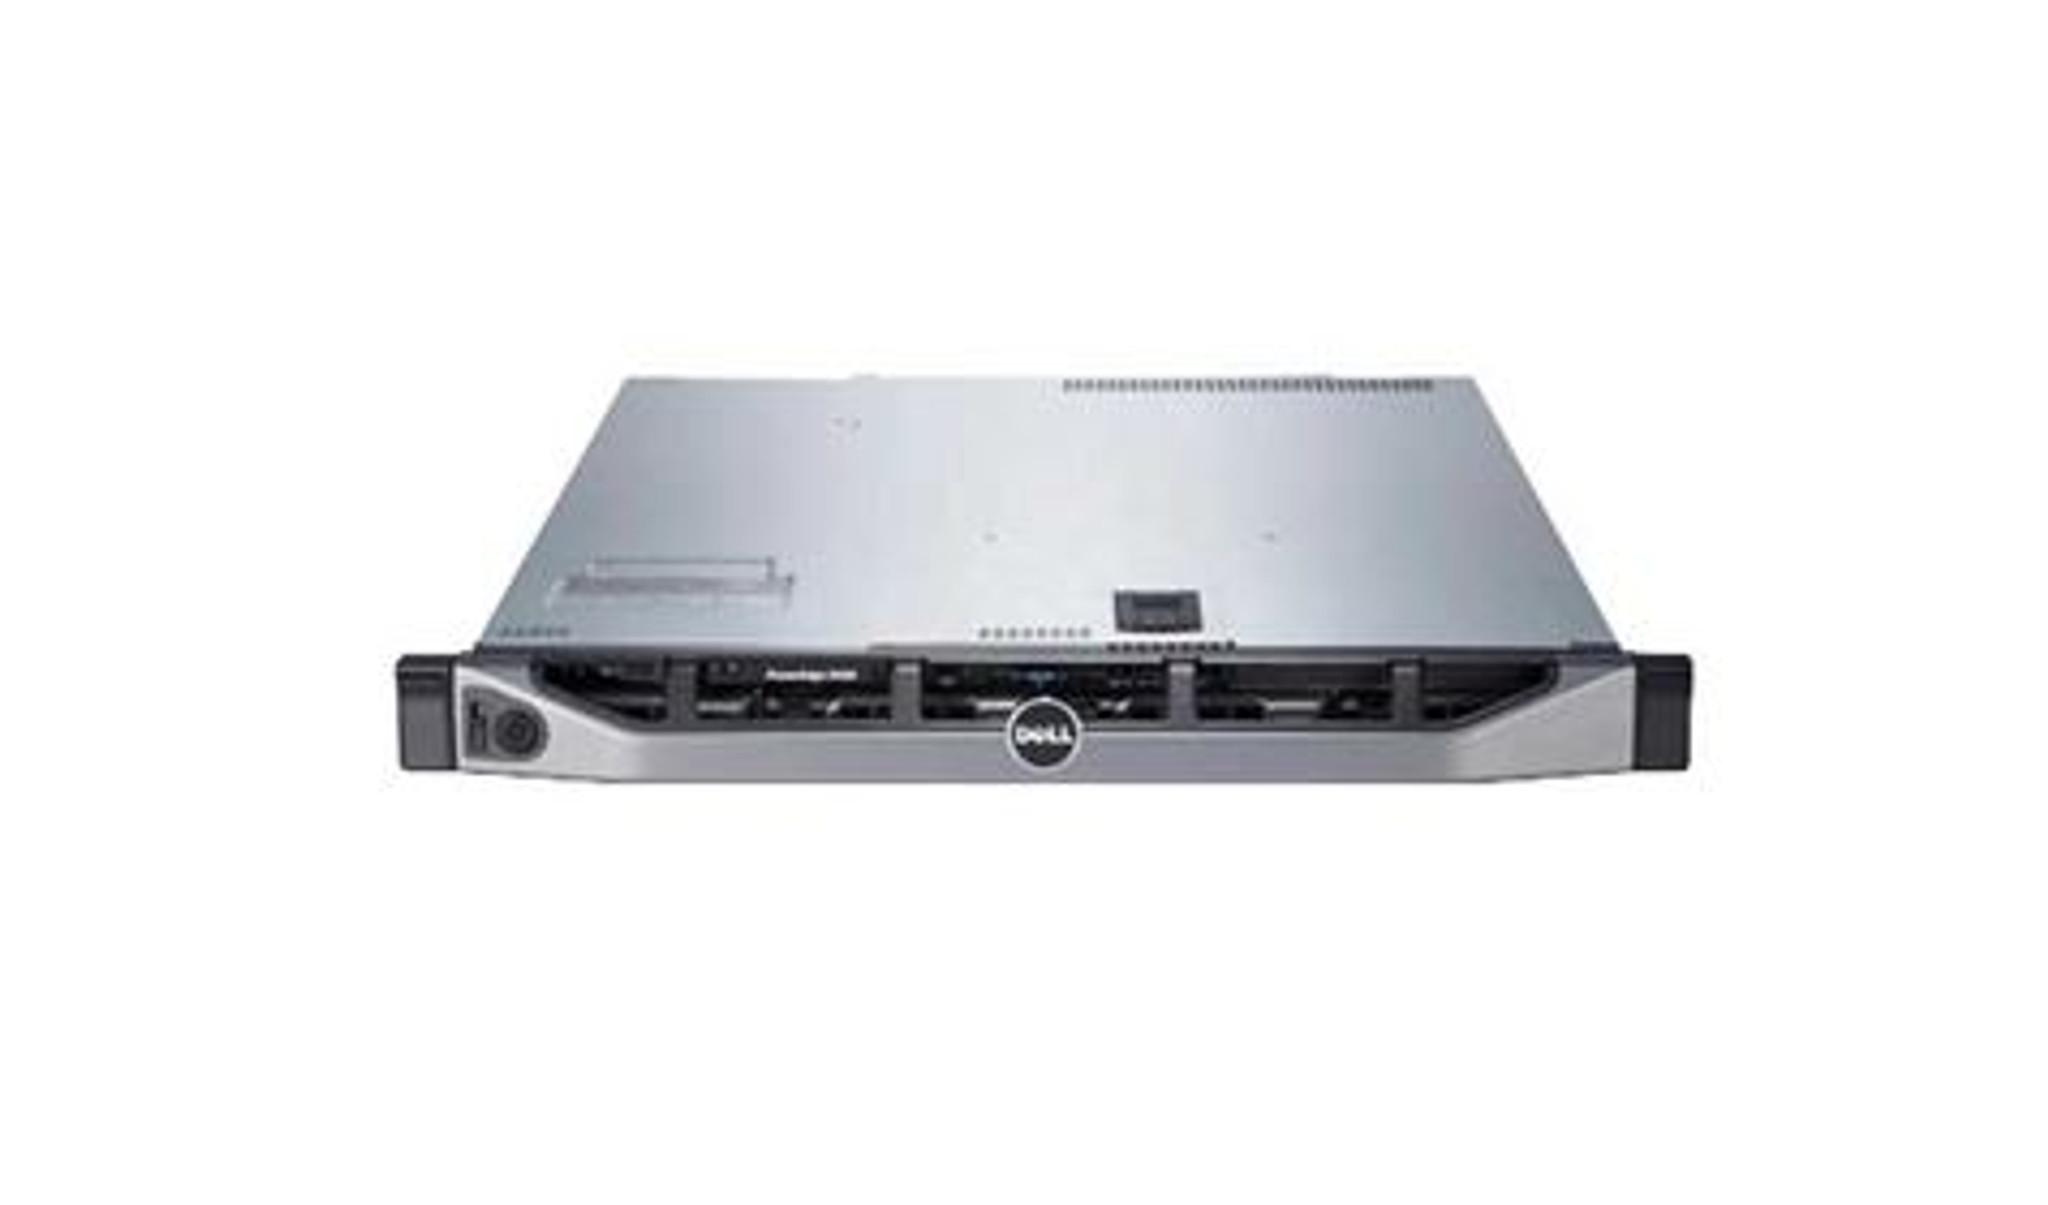 Dell PowerEdge R430 Server - 3 5